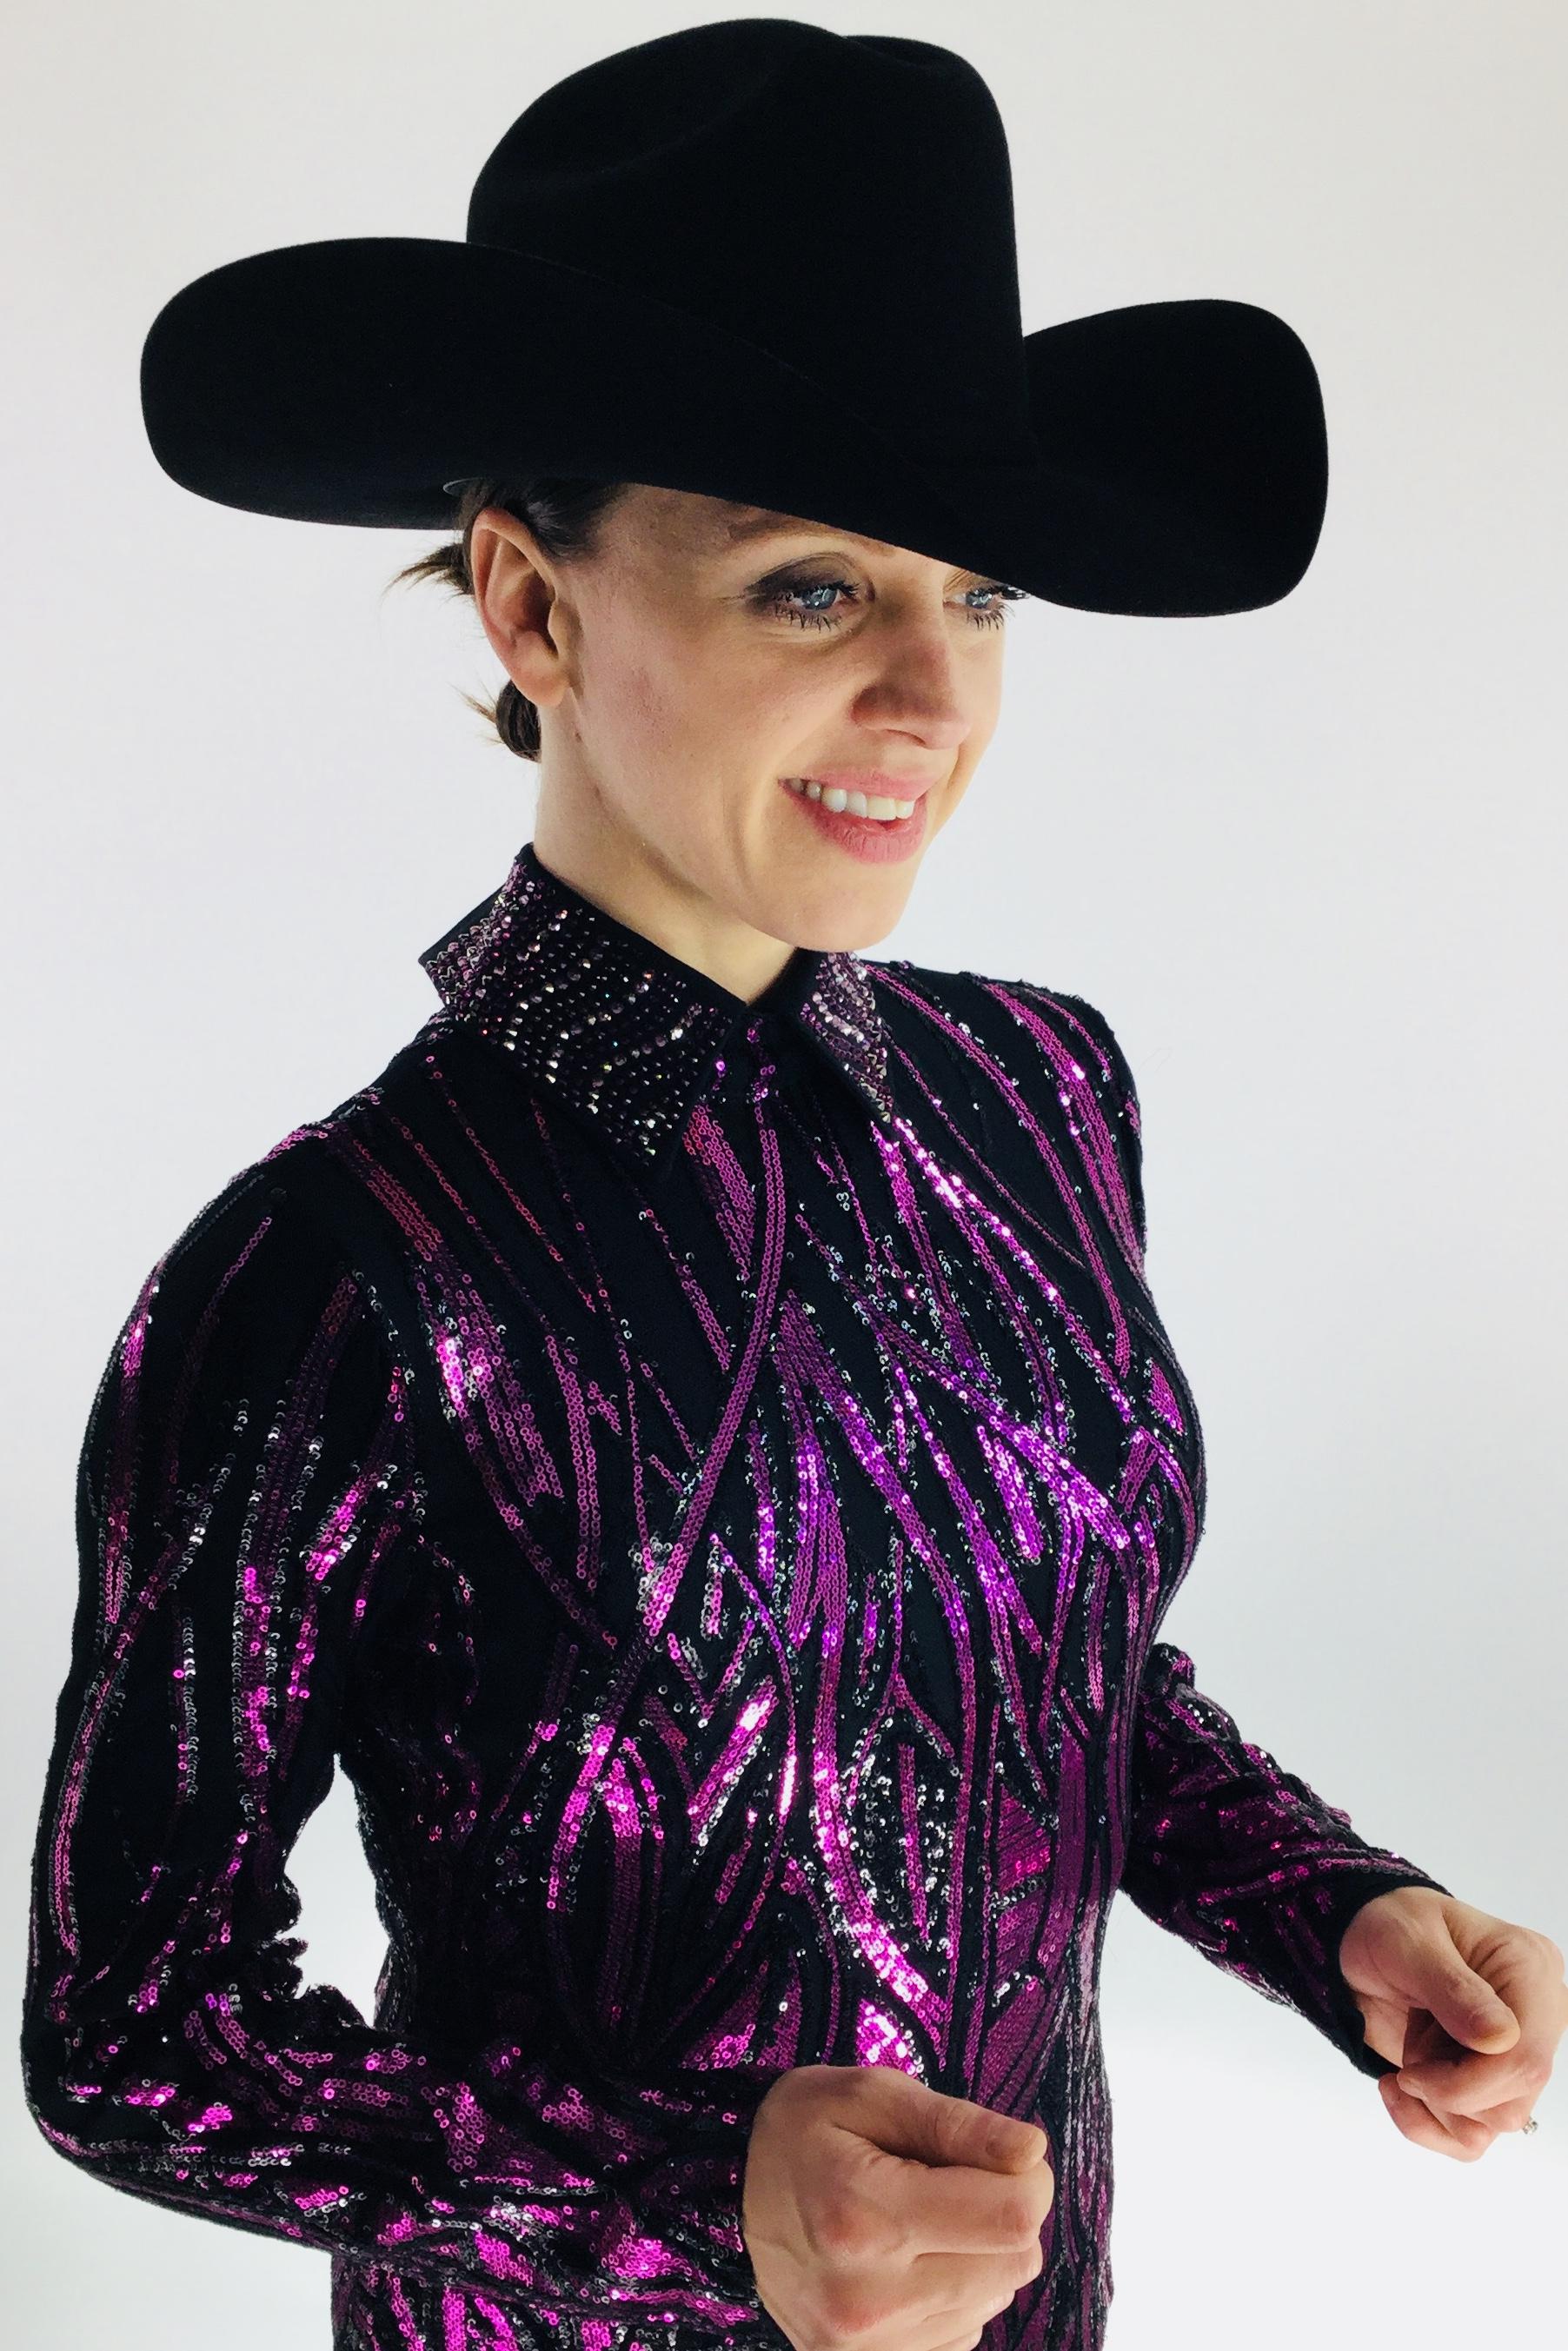 sparkle-ridge-black-and-purple-sequin-western-show-shirts-anita5.jpg